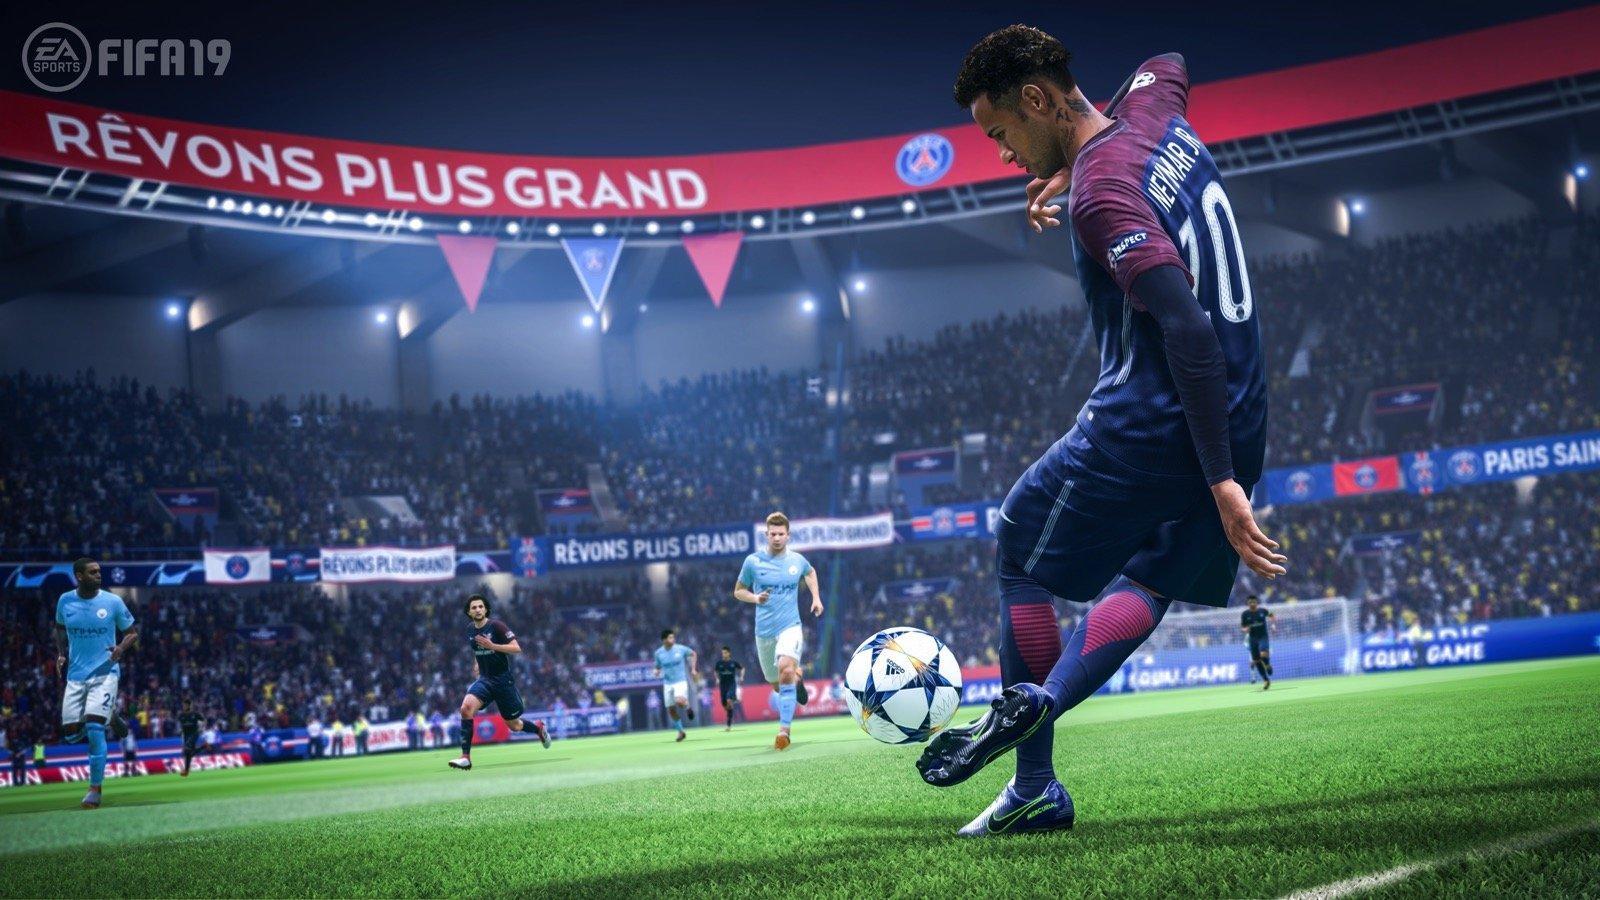 The scripting debate is hotting up in FIFA 19